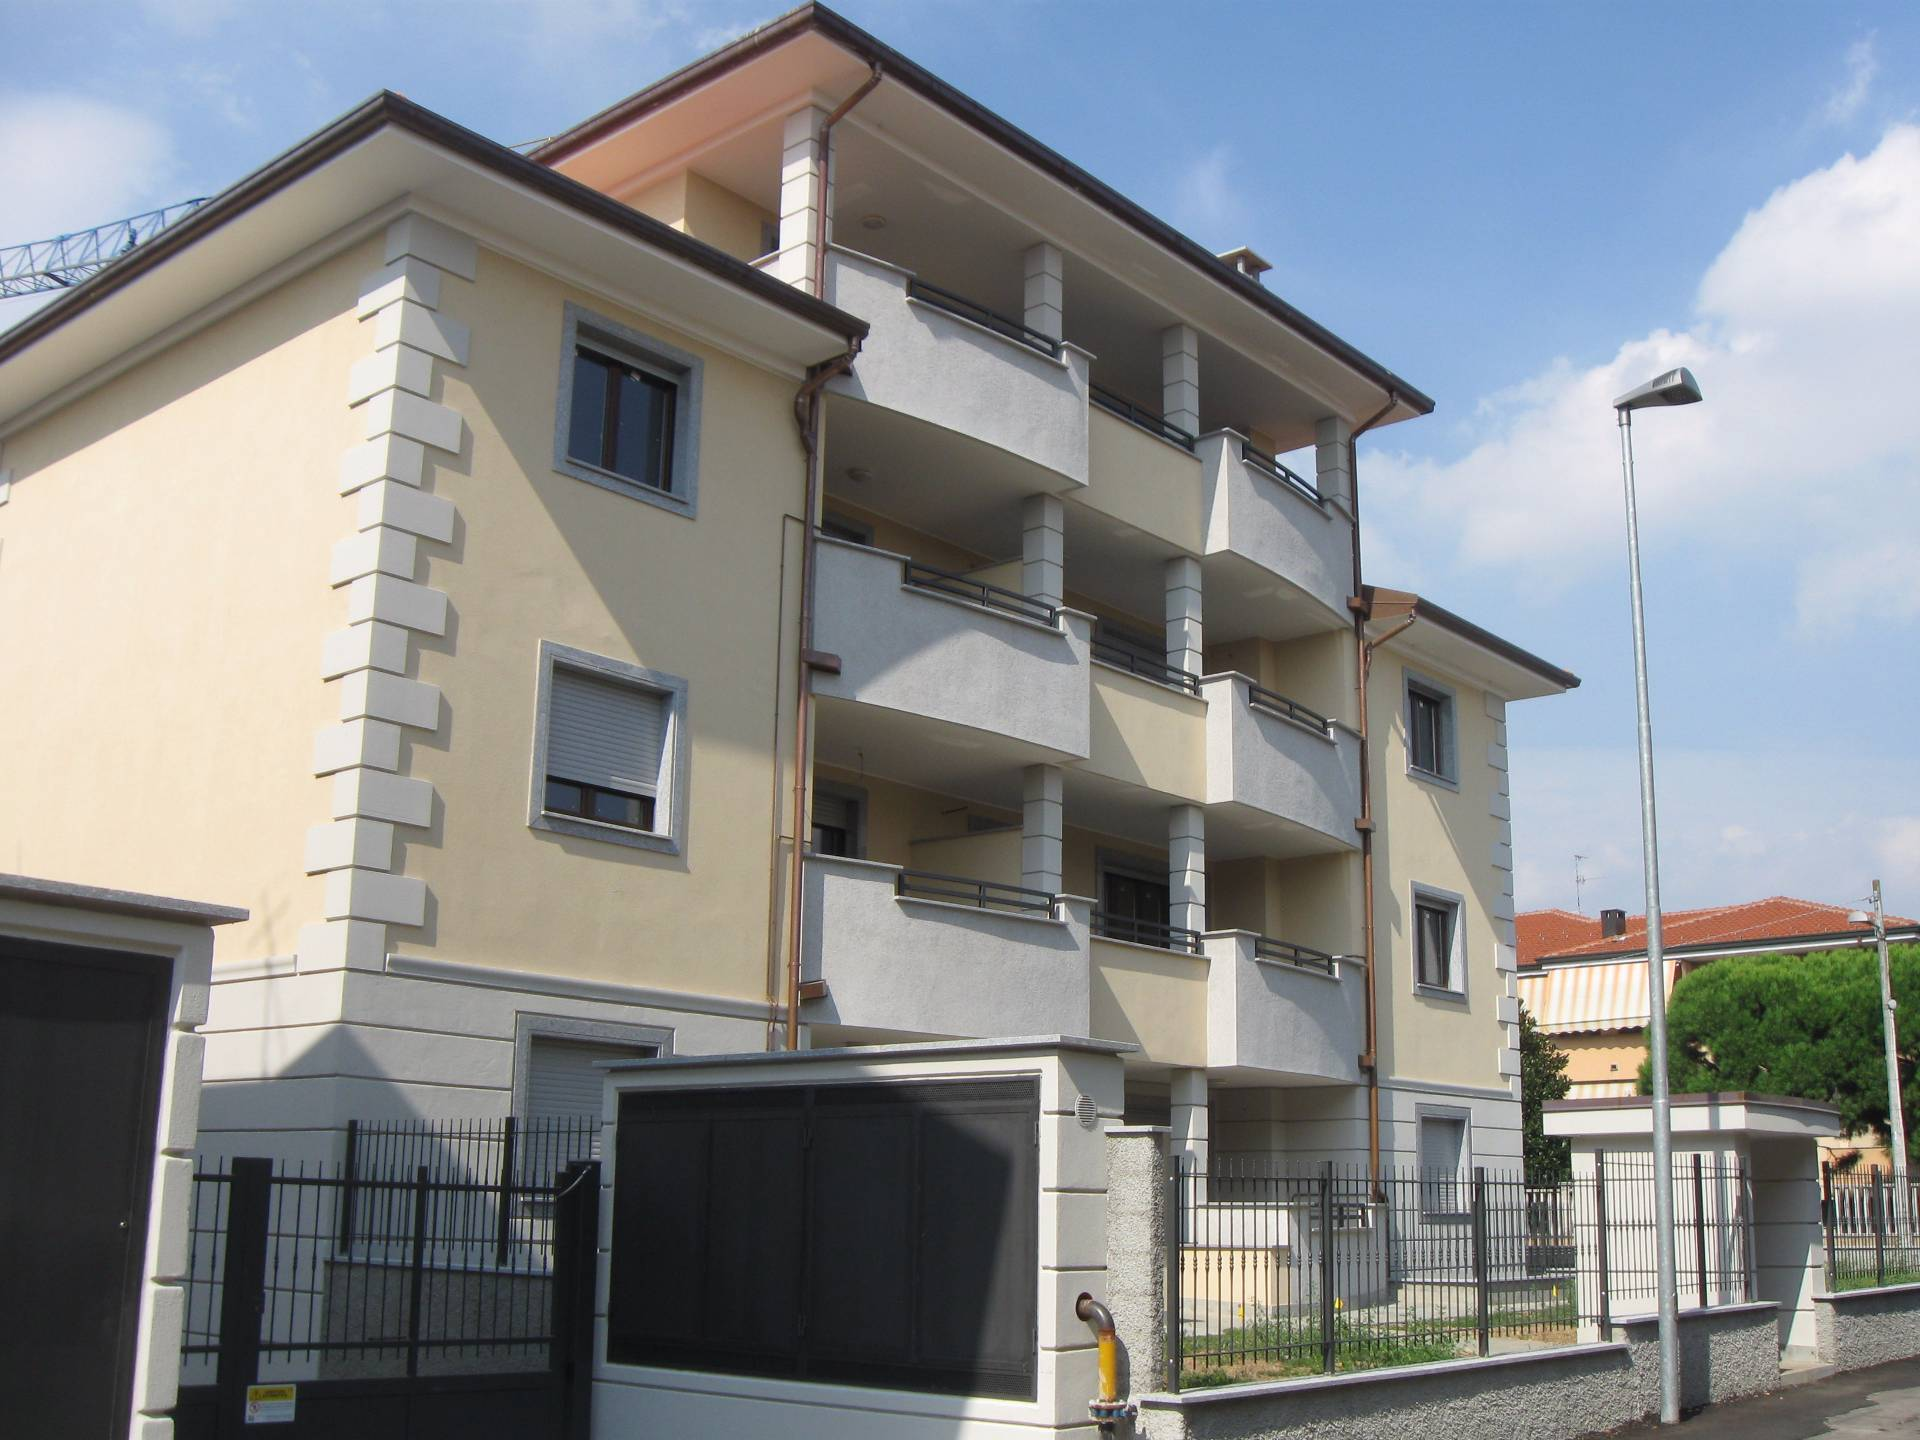 Busto Garolfo | Appartamento in Vendita in via Sauro | lacasadimilano.it